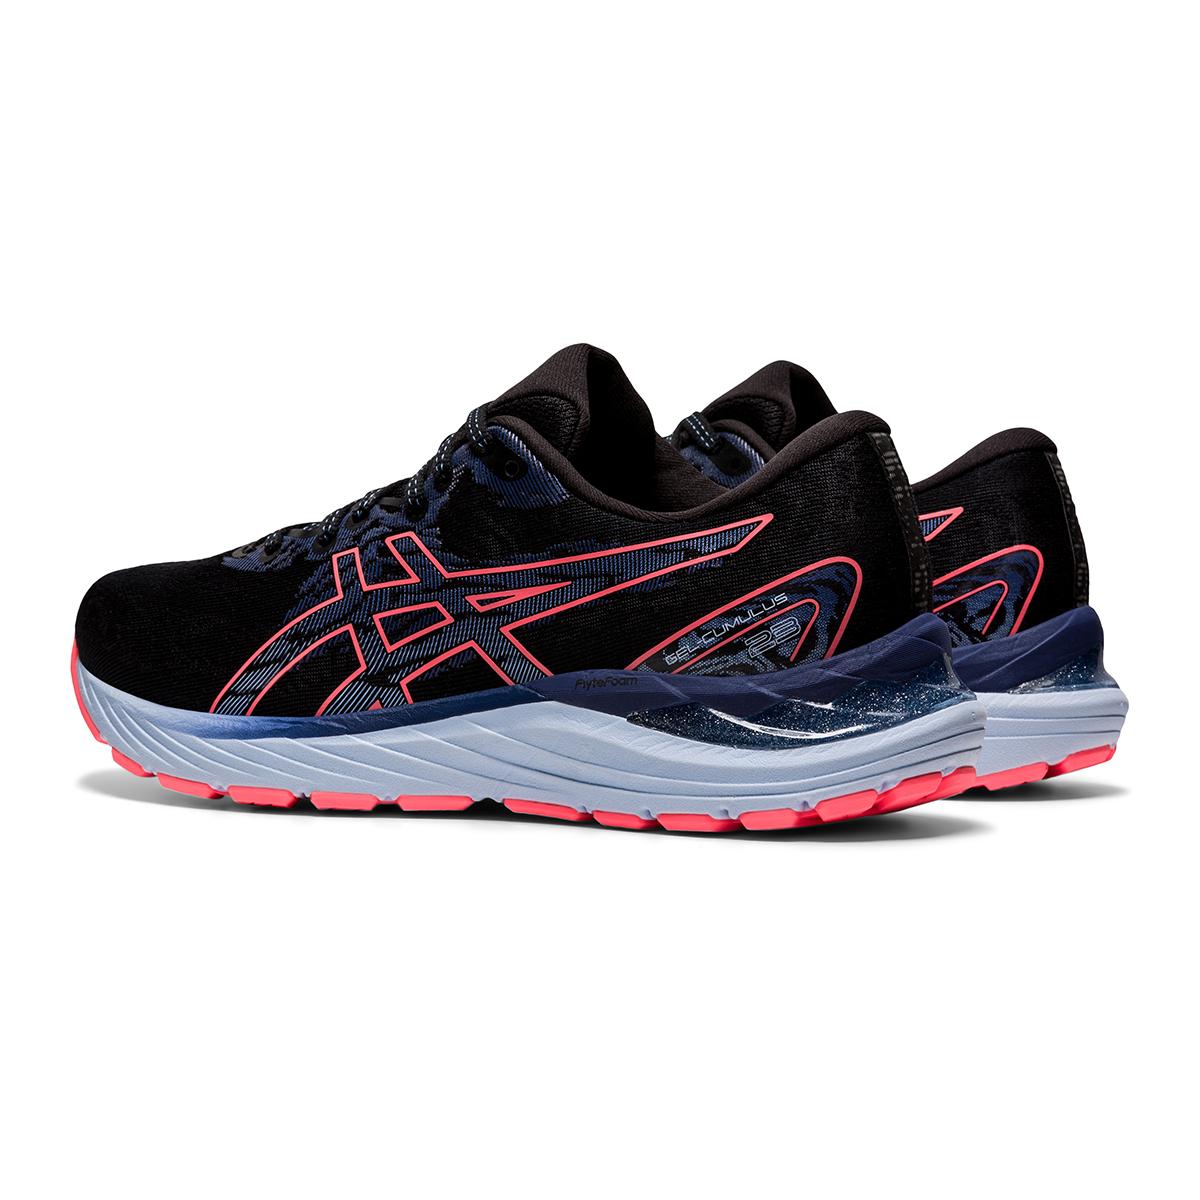 Women's Asics Gel-Cumulus 23 Running Shoe - Color: Black/Blazing Coral - Size: 5 - Width: Regular, Black/Blazing Coral, large, image 4